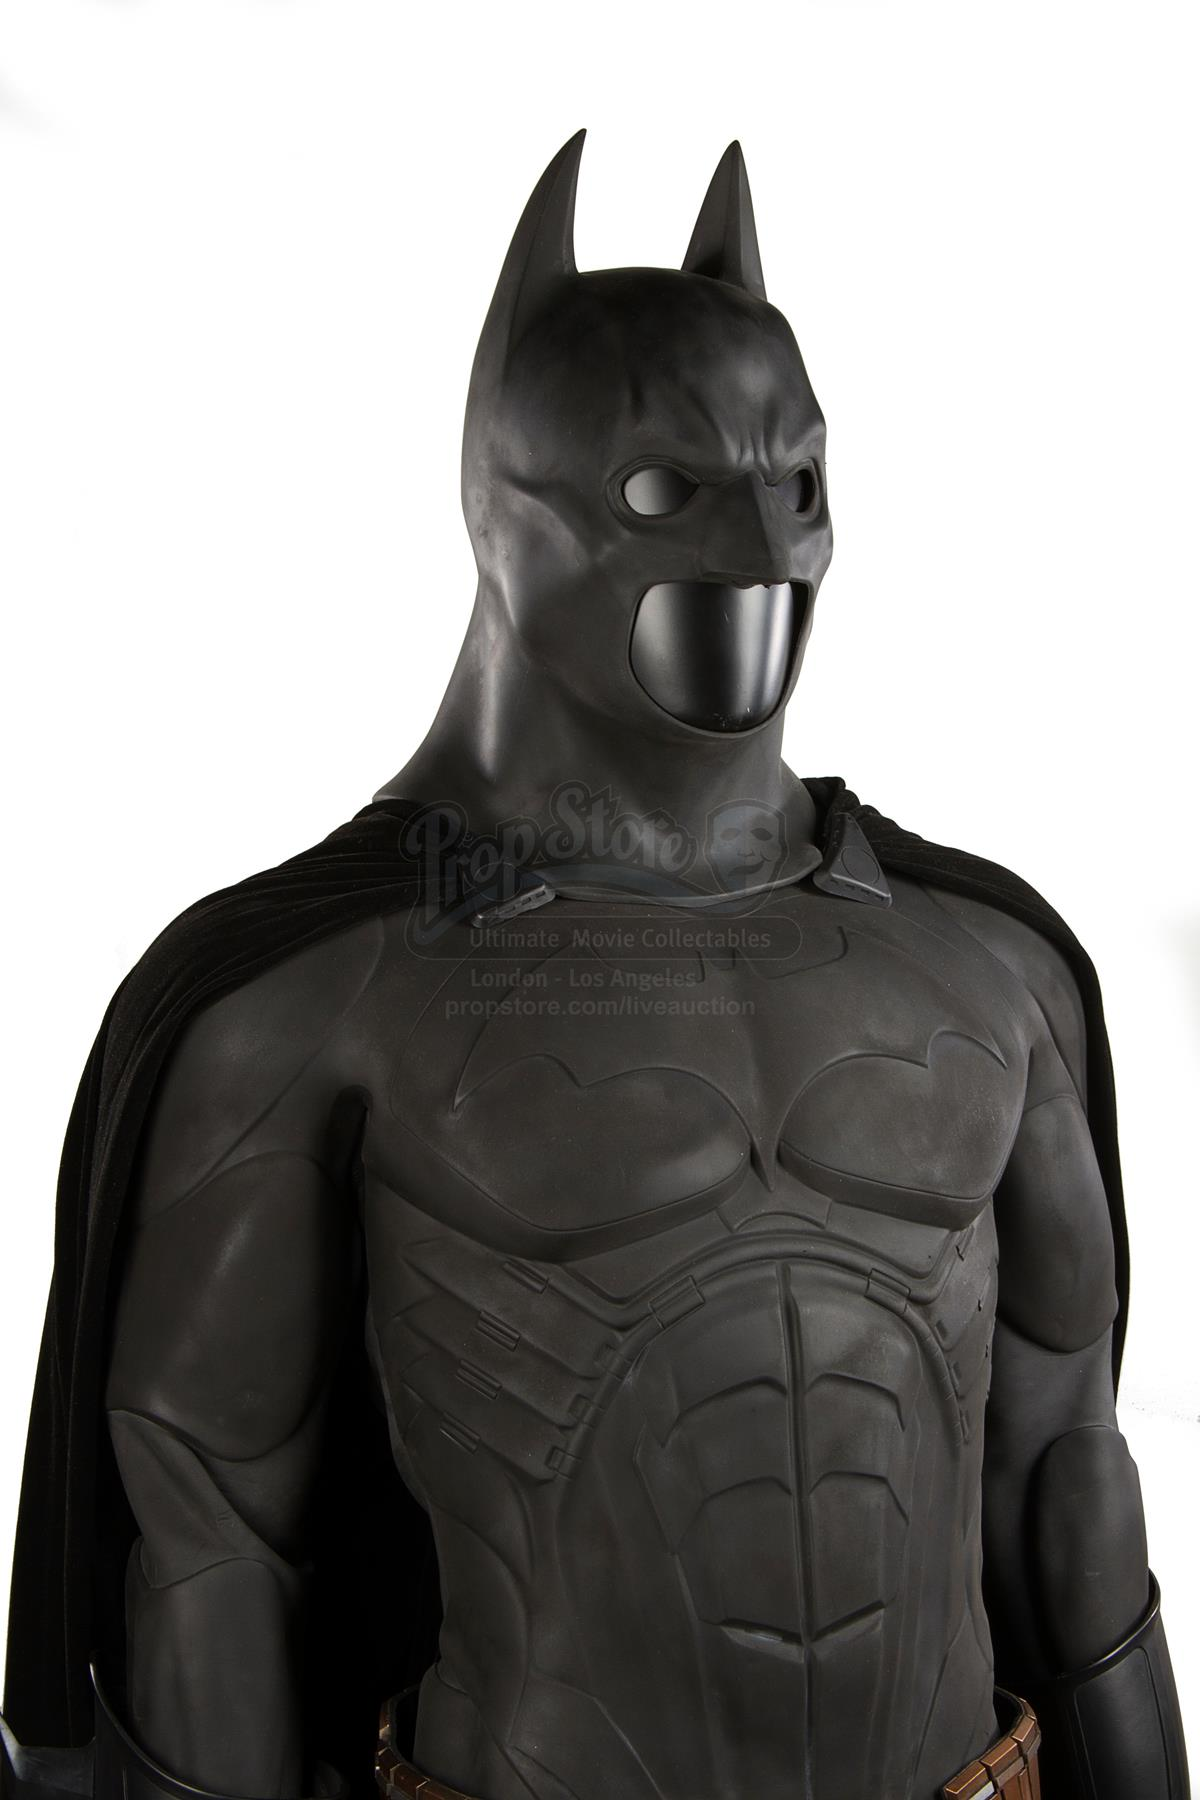 Prop store ultimate movie collectables batman begins voltagebd Image collections